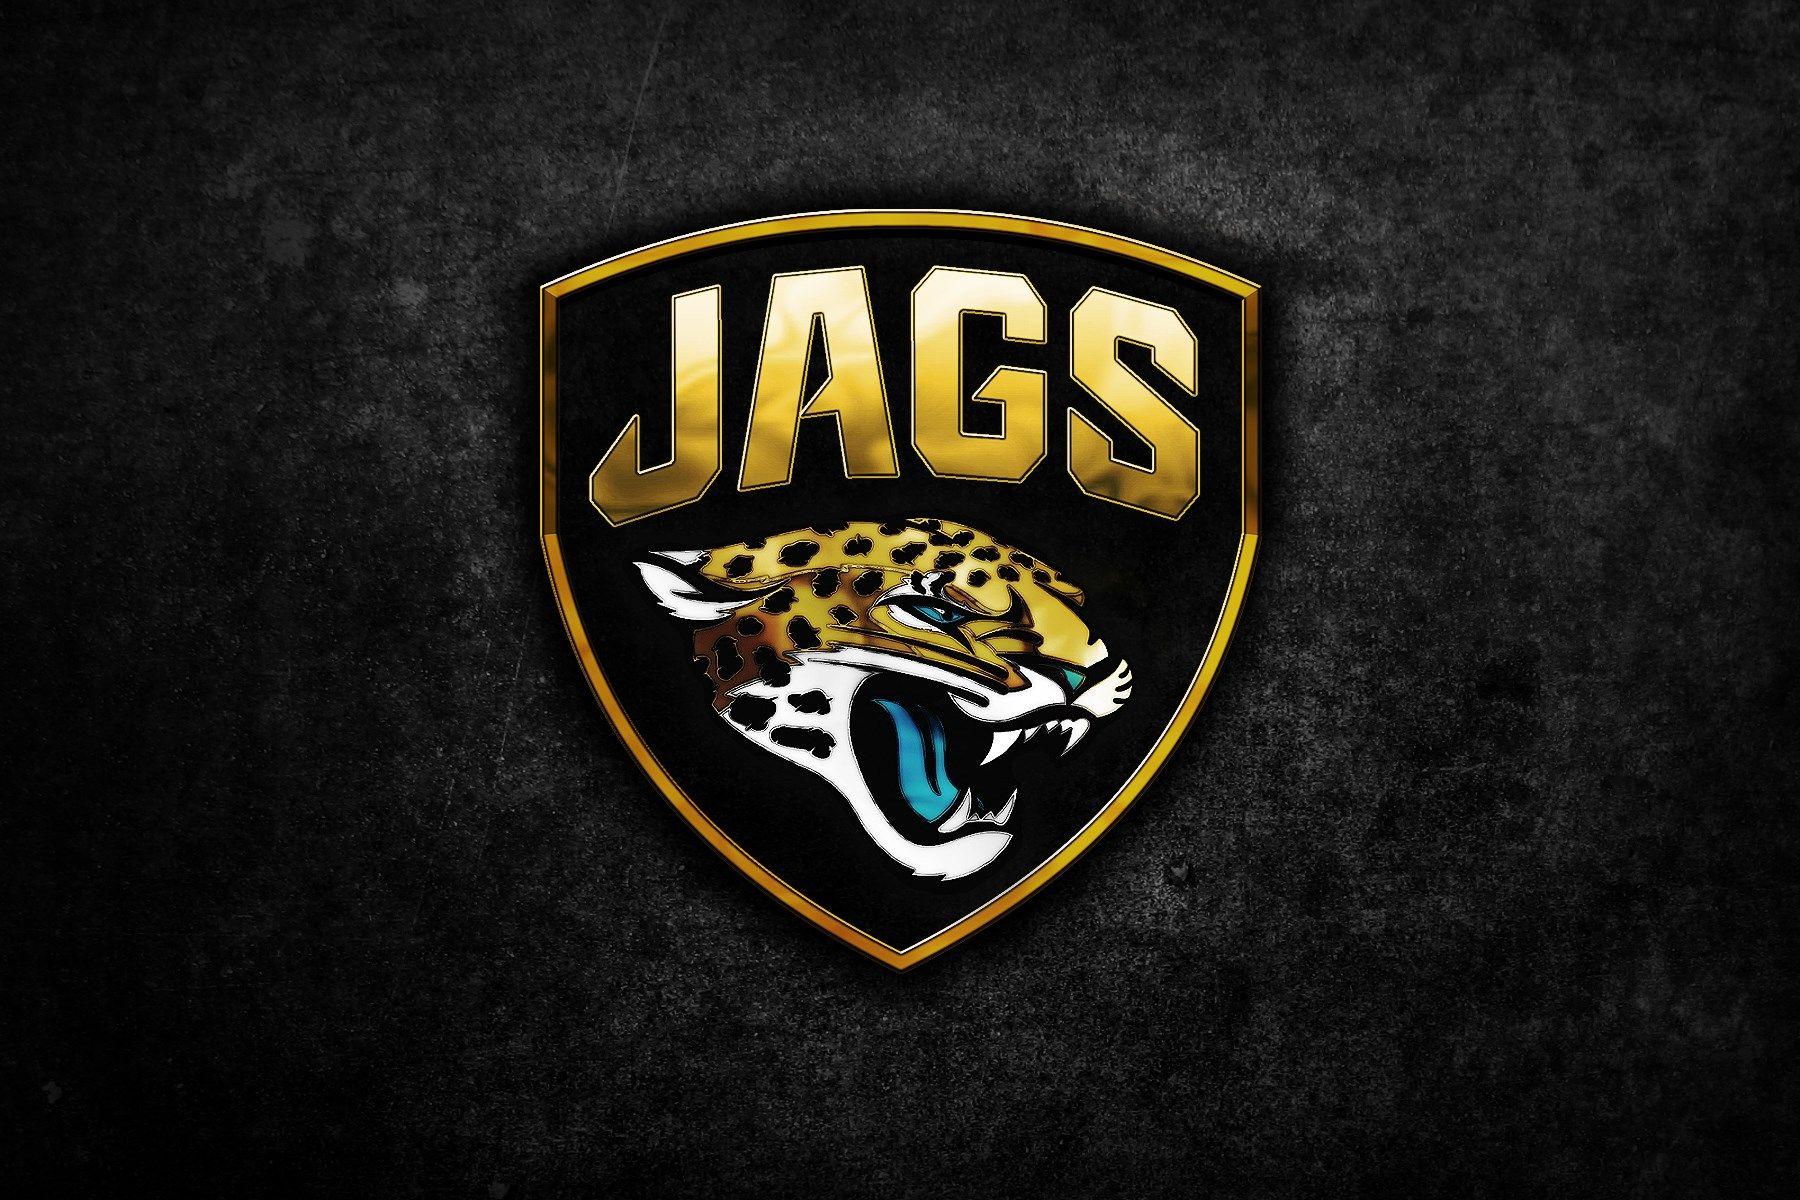 Jacksonville Jaguars Wallpaper Jacksonville Jaguars Pinterest